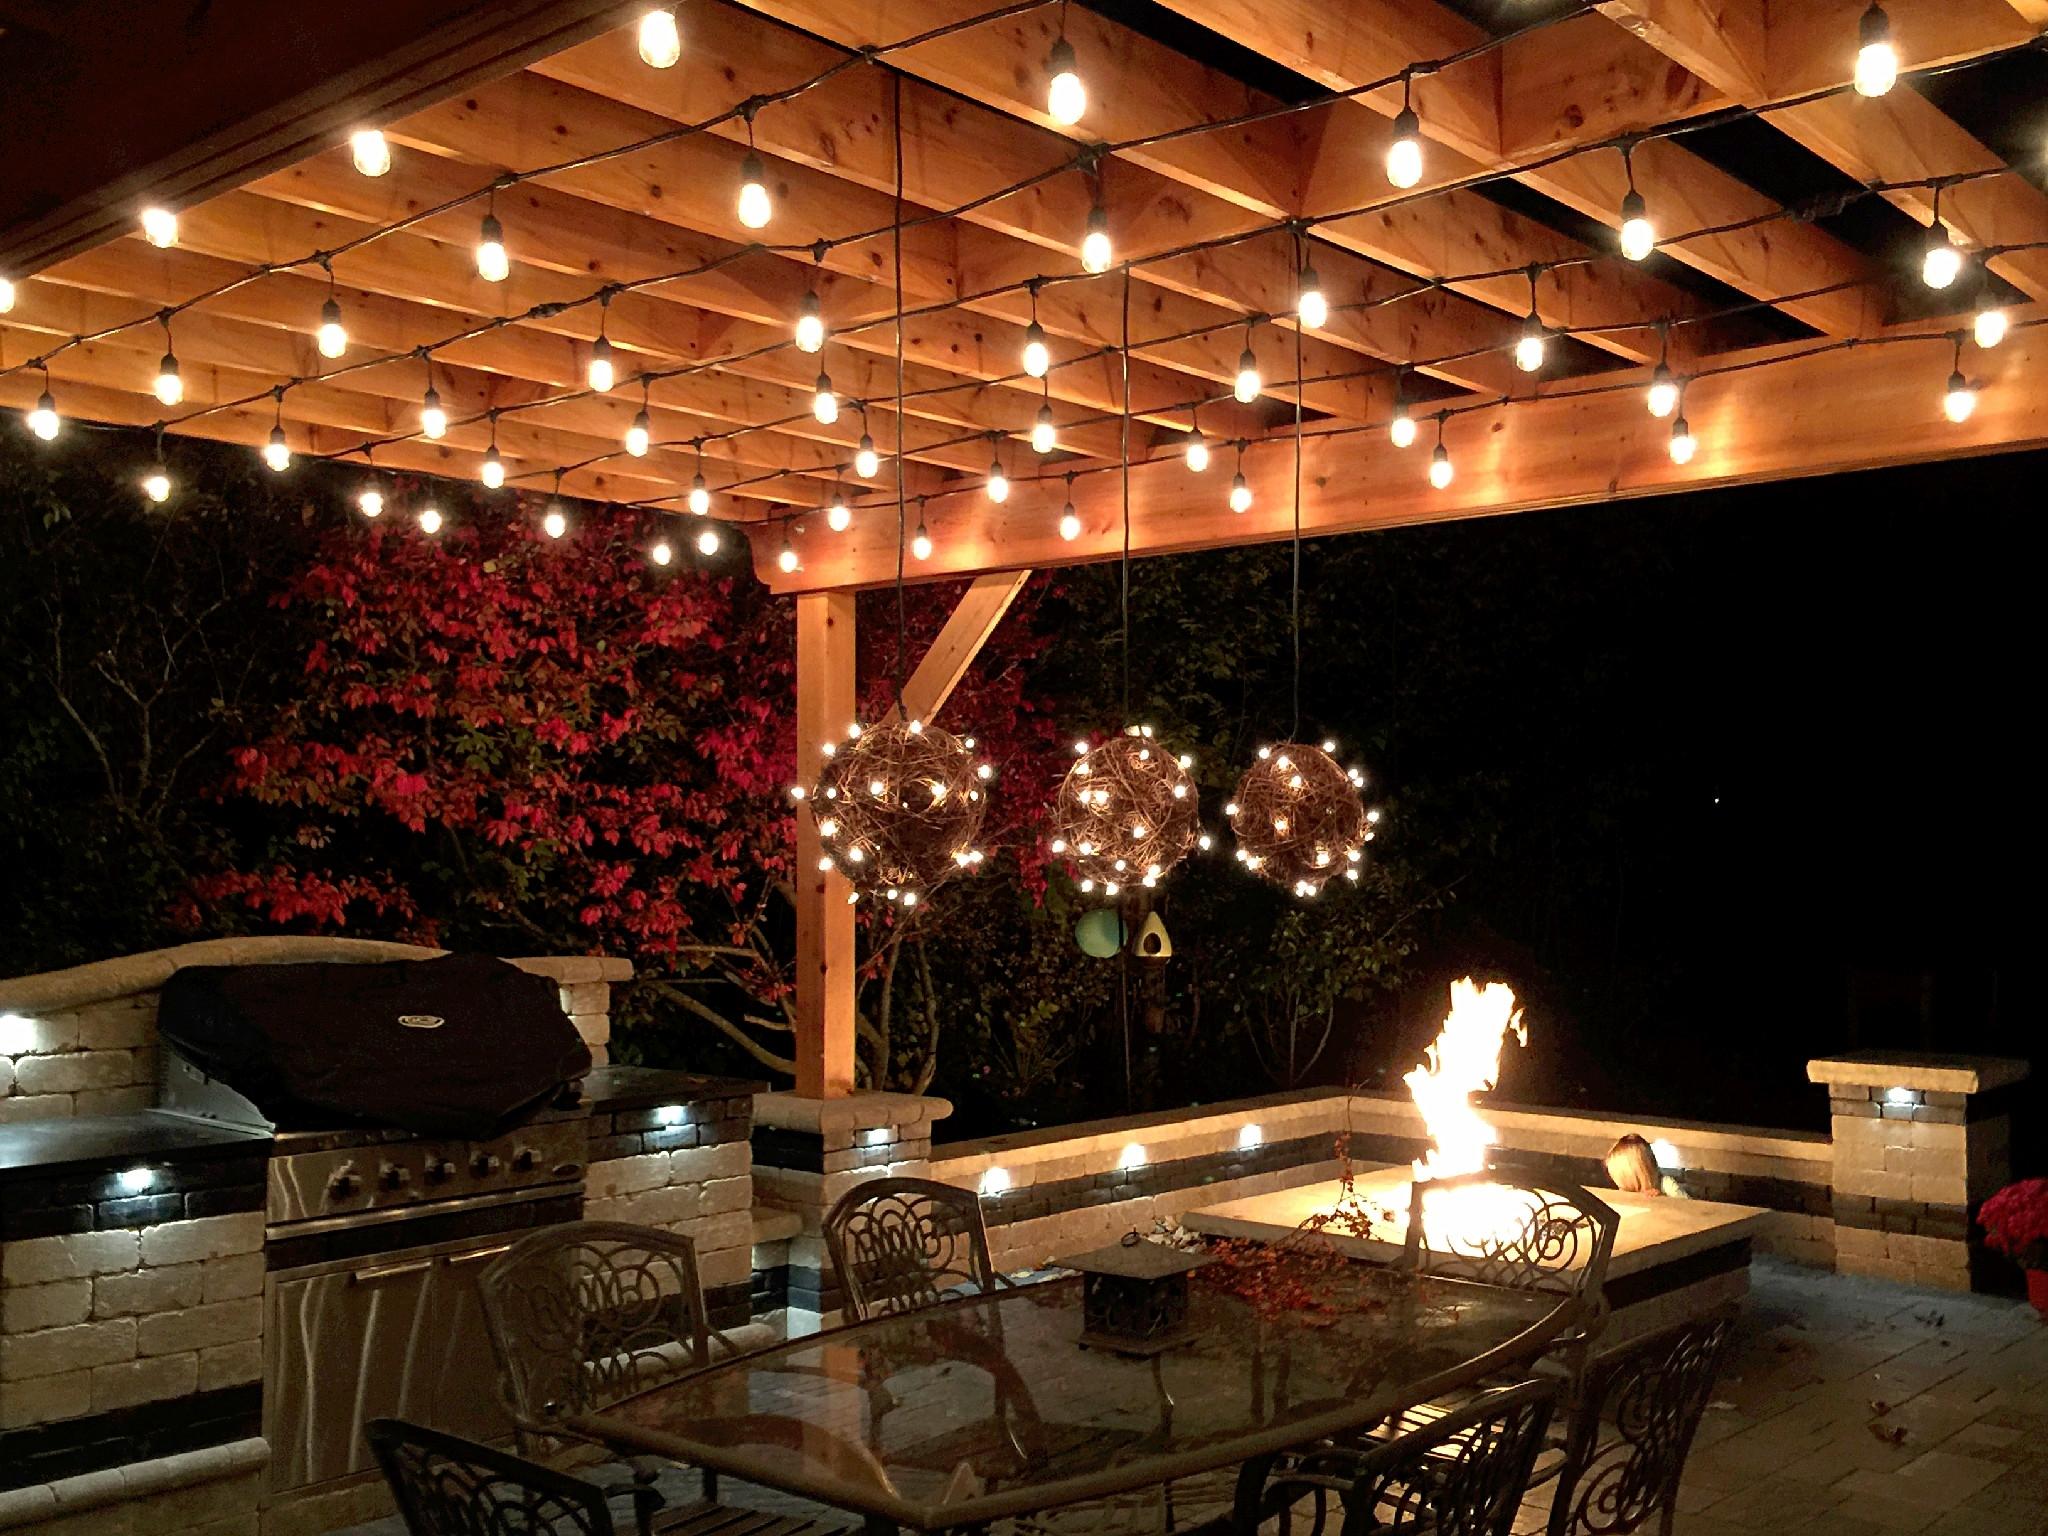 Inspiration about Pergola Design Ideas Outdoor Pergola Lighting Pergola Shade With Regard To Outdoor Hanging Lights For Pergola (#9 of 15)